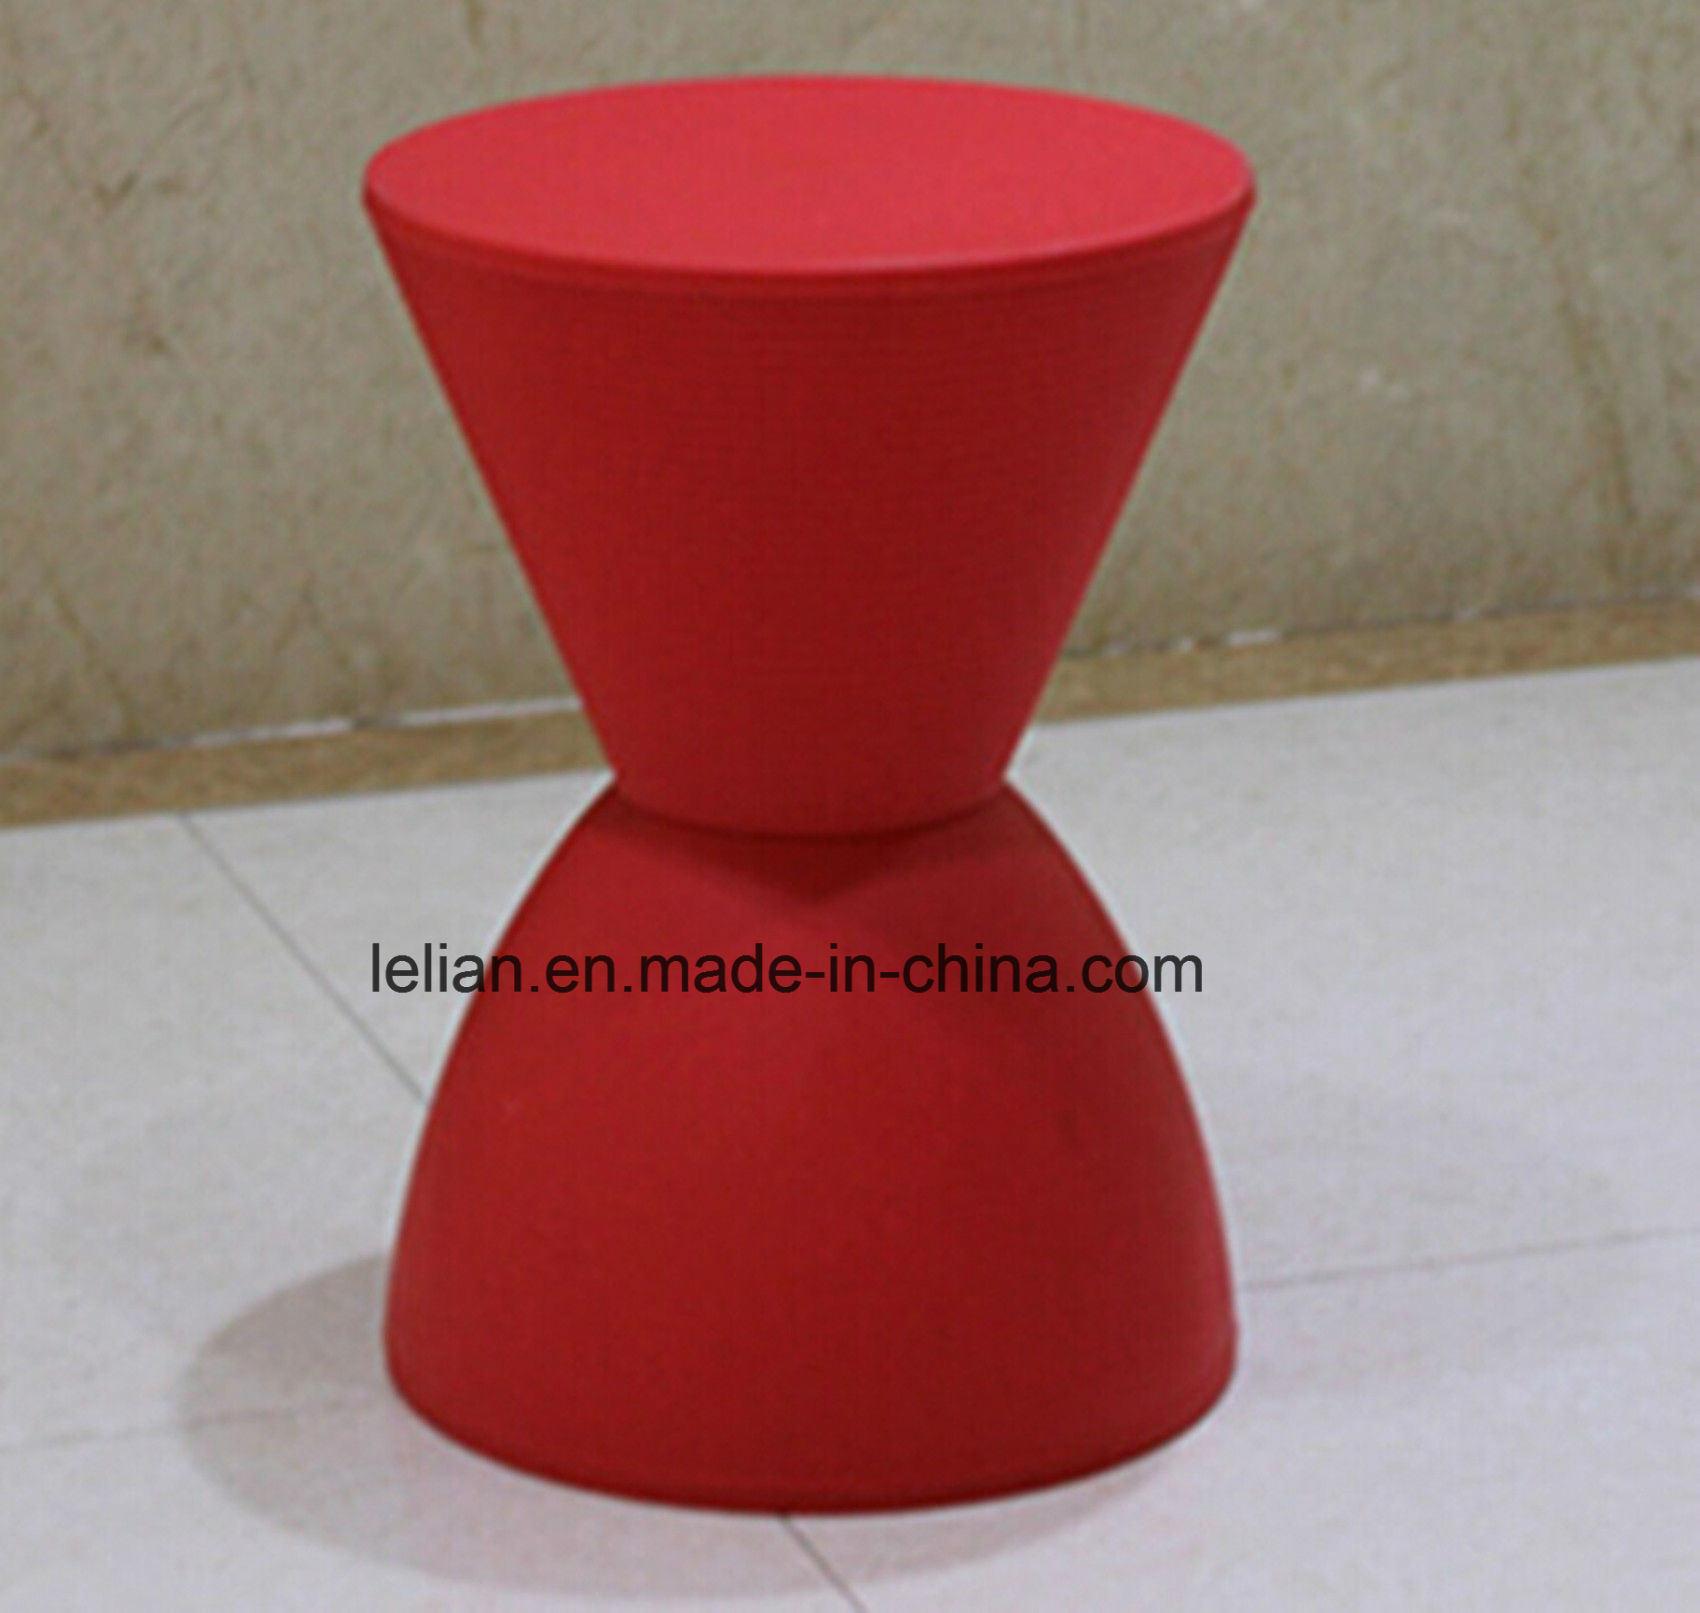 China Plastic Stool Prince Aha Stools Replica Designed Stool (LL 0059)    China Storage Tea Stool, Living Room Stool